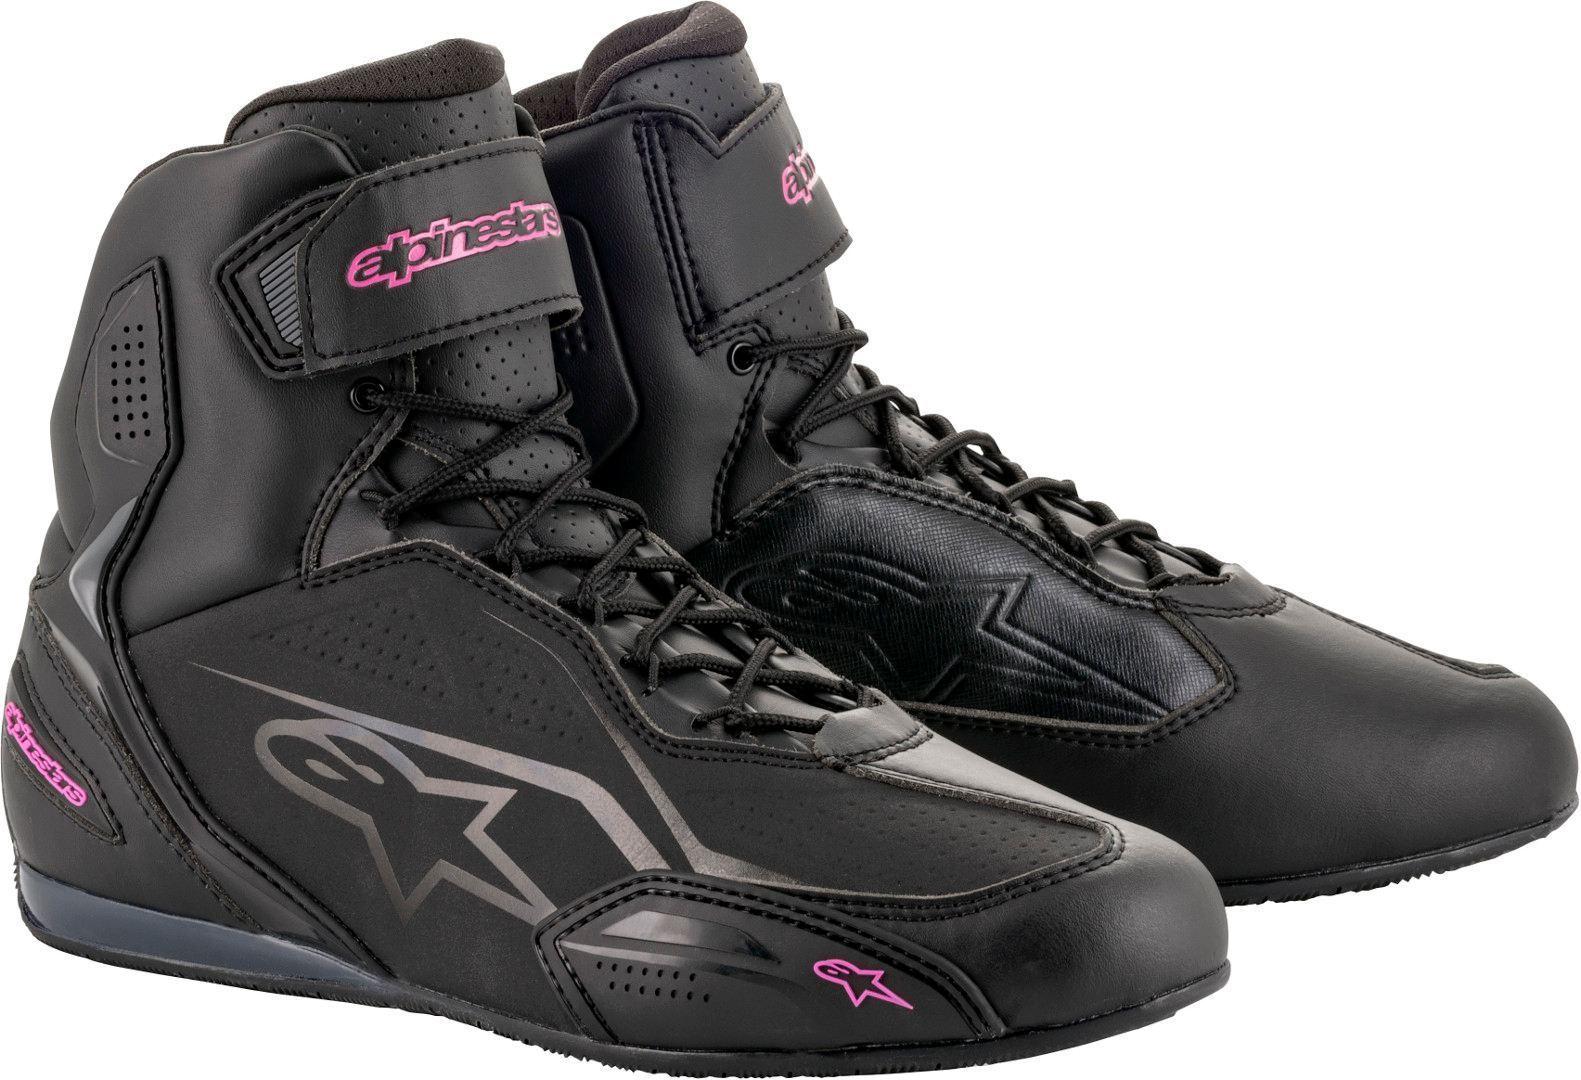 Alpinestars Stella Faster-3 Chaussures de moto de dames Noir Rose taille : 39 40